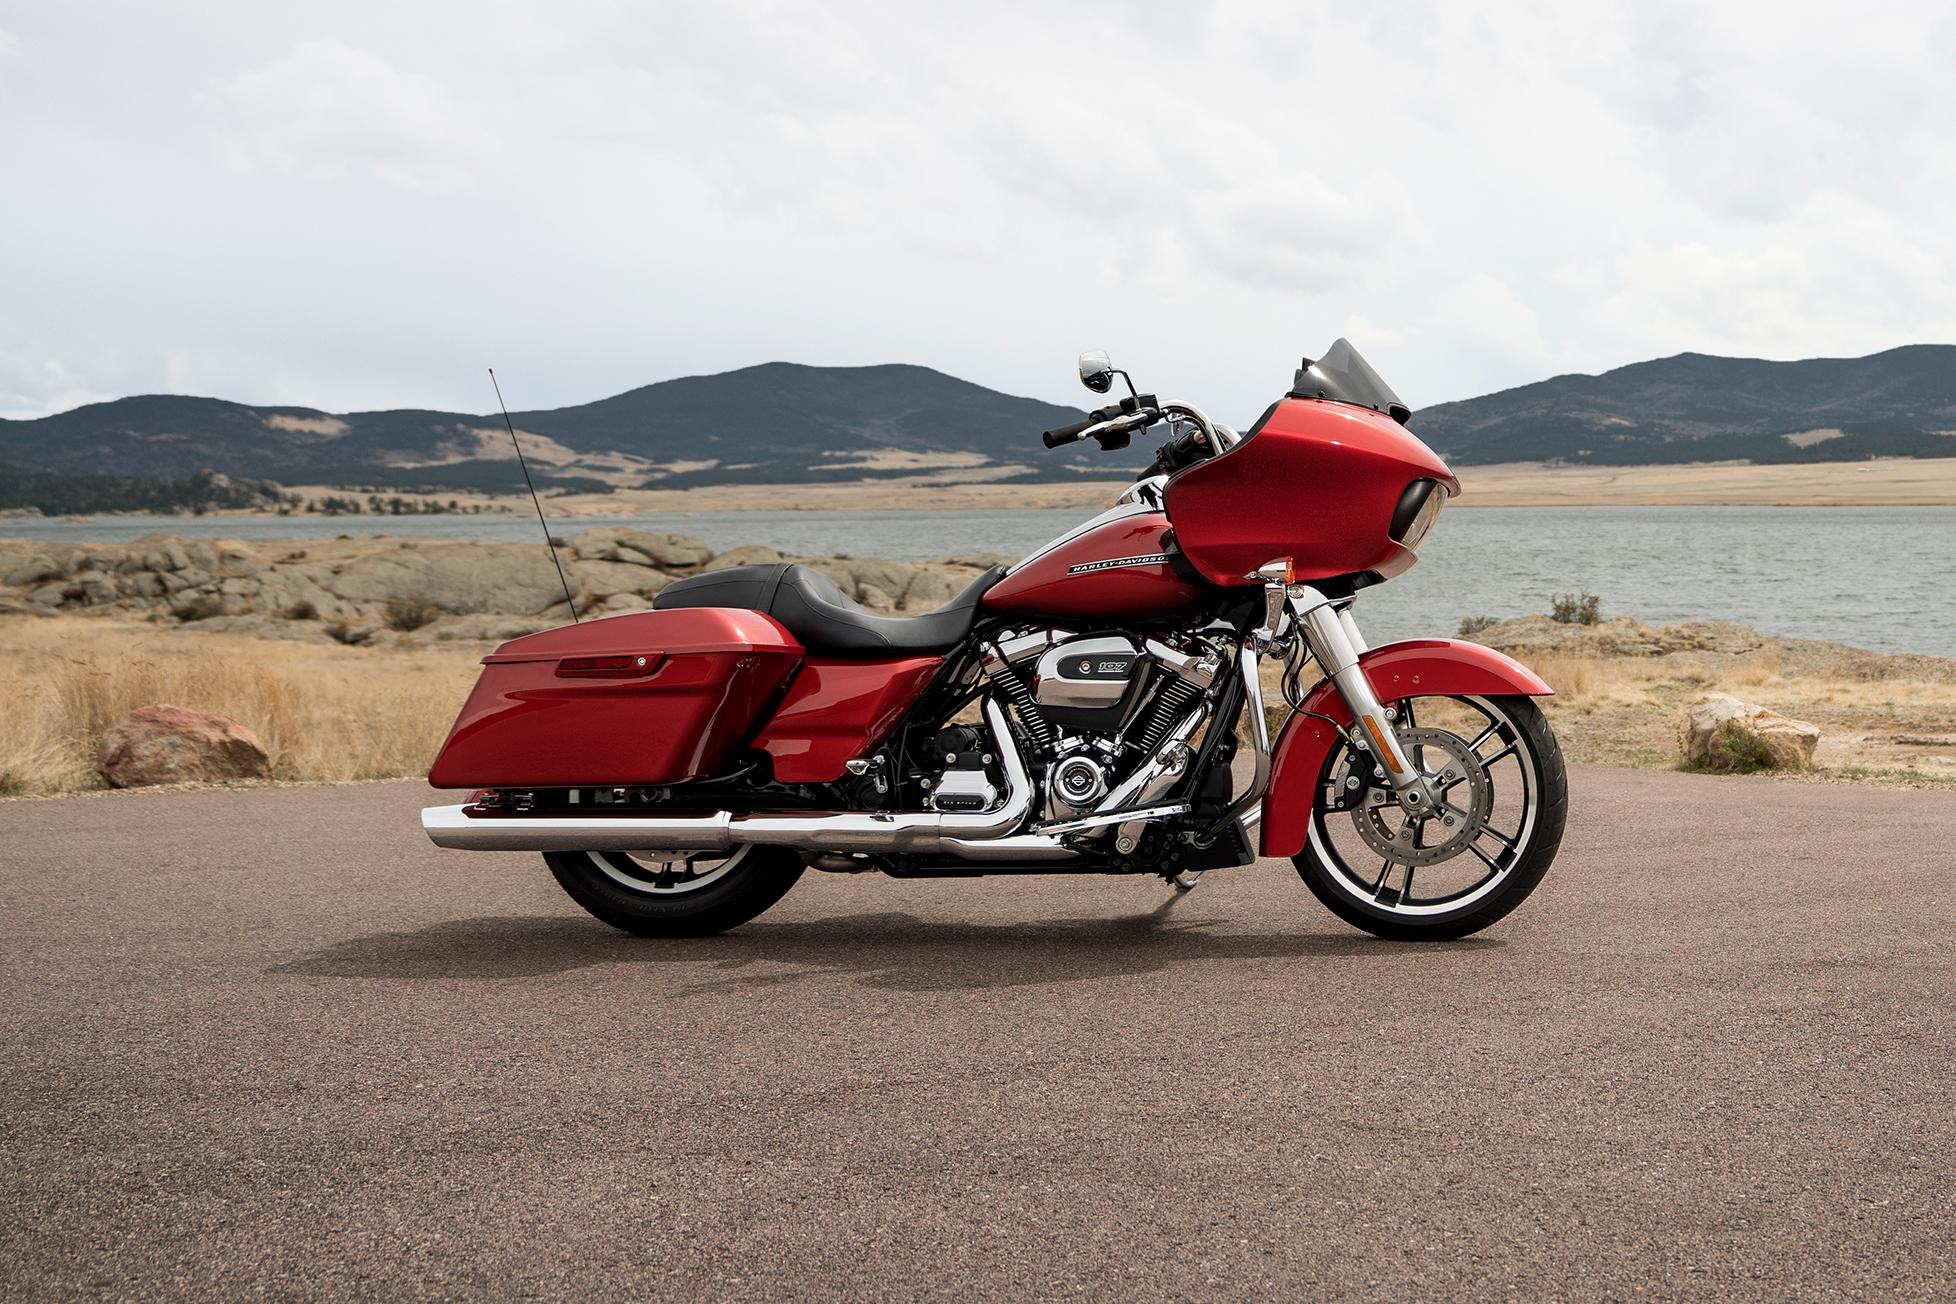 Harley Davidson Com: 2019 Road Glide Motorcycle